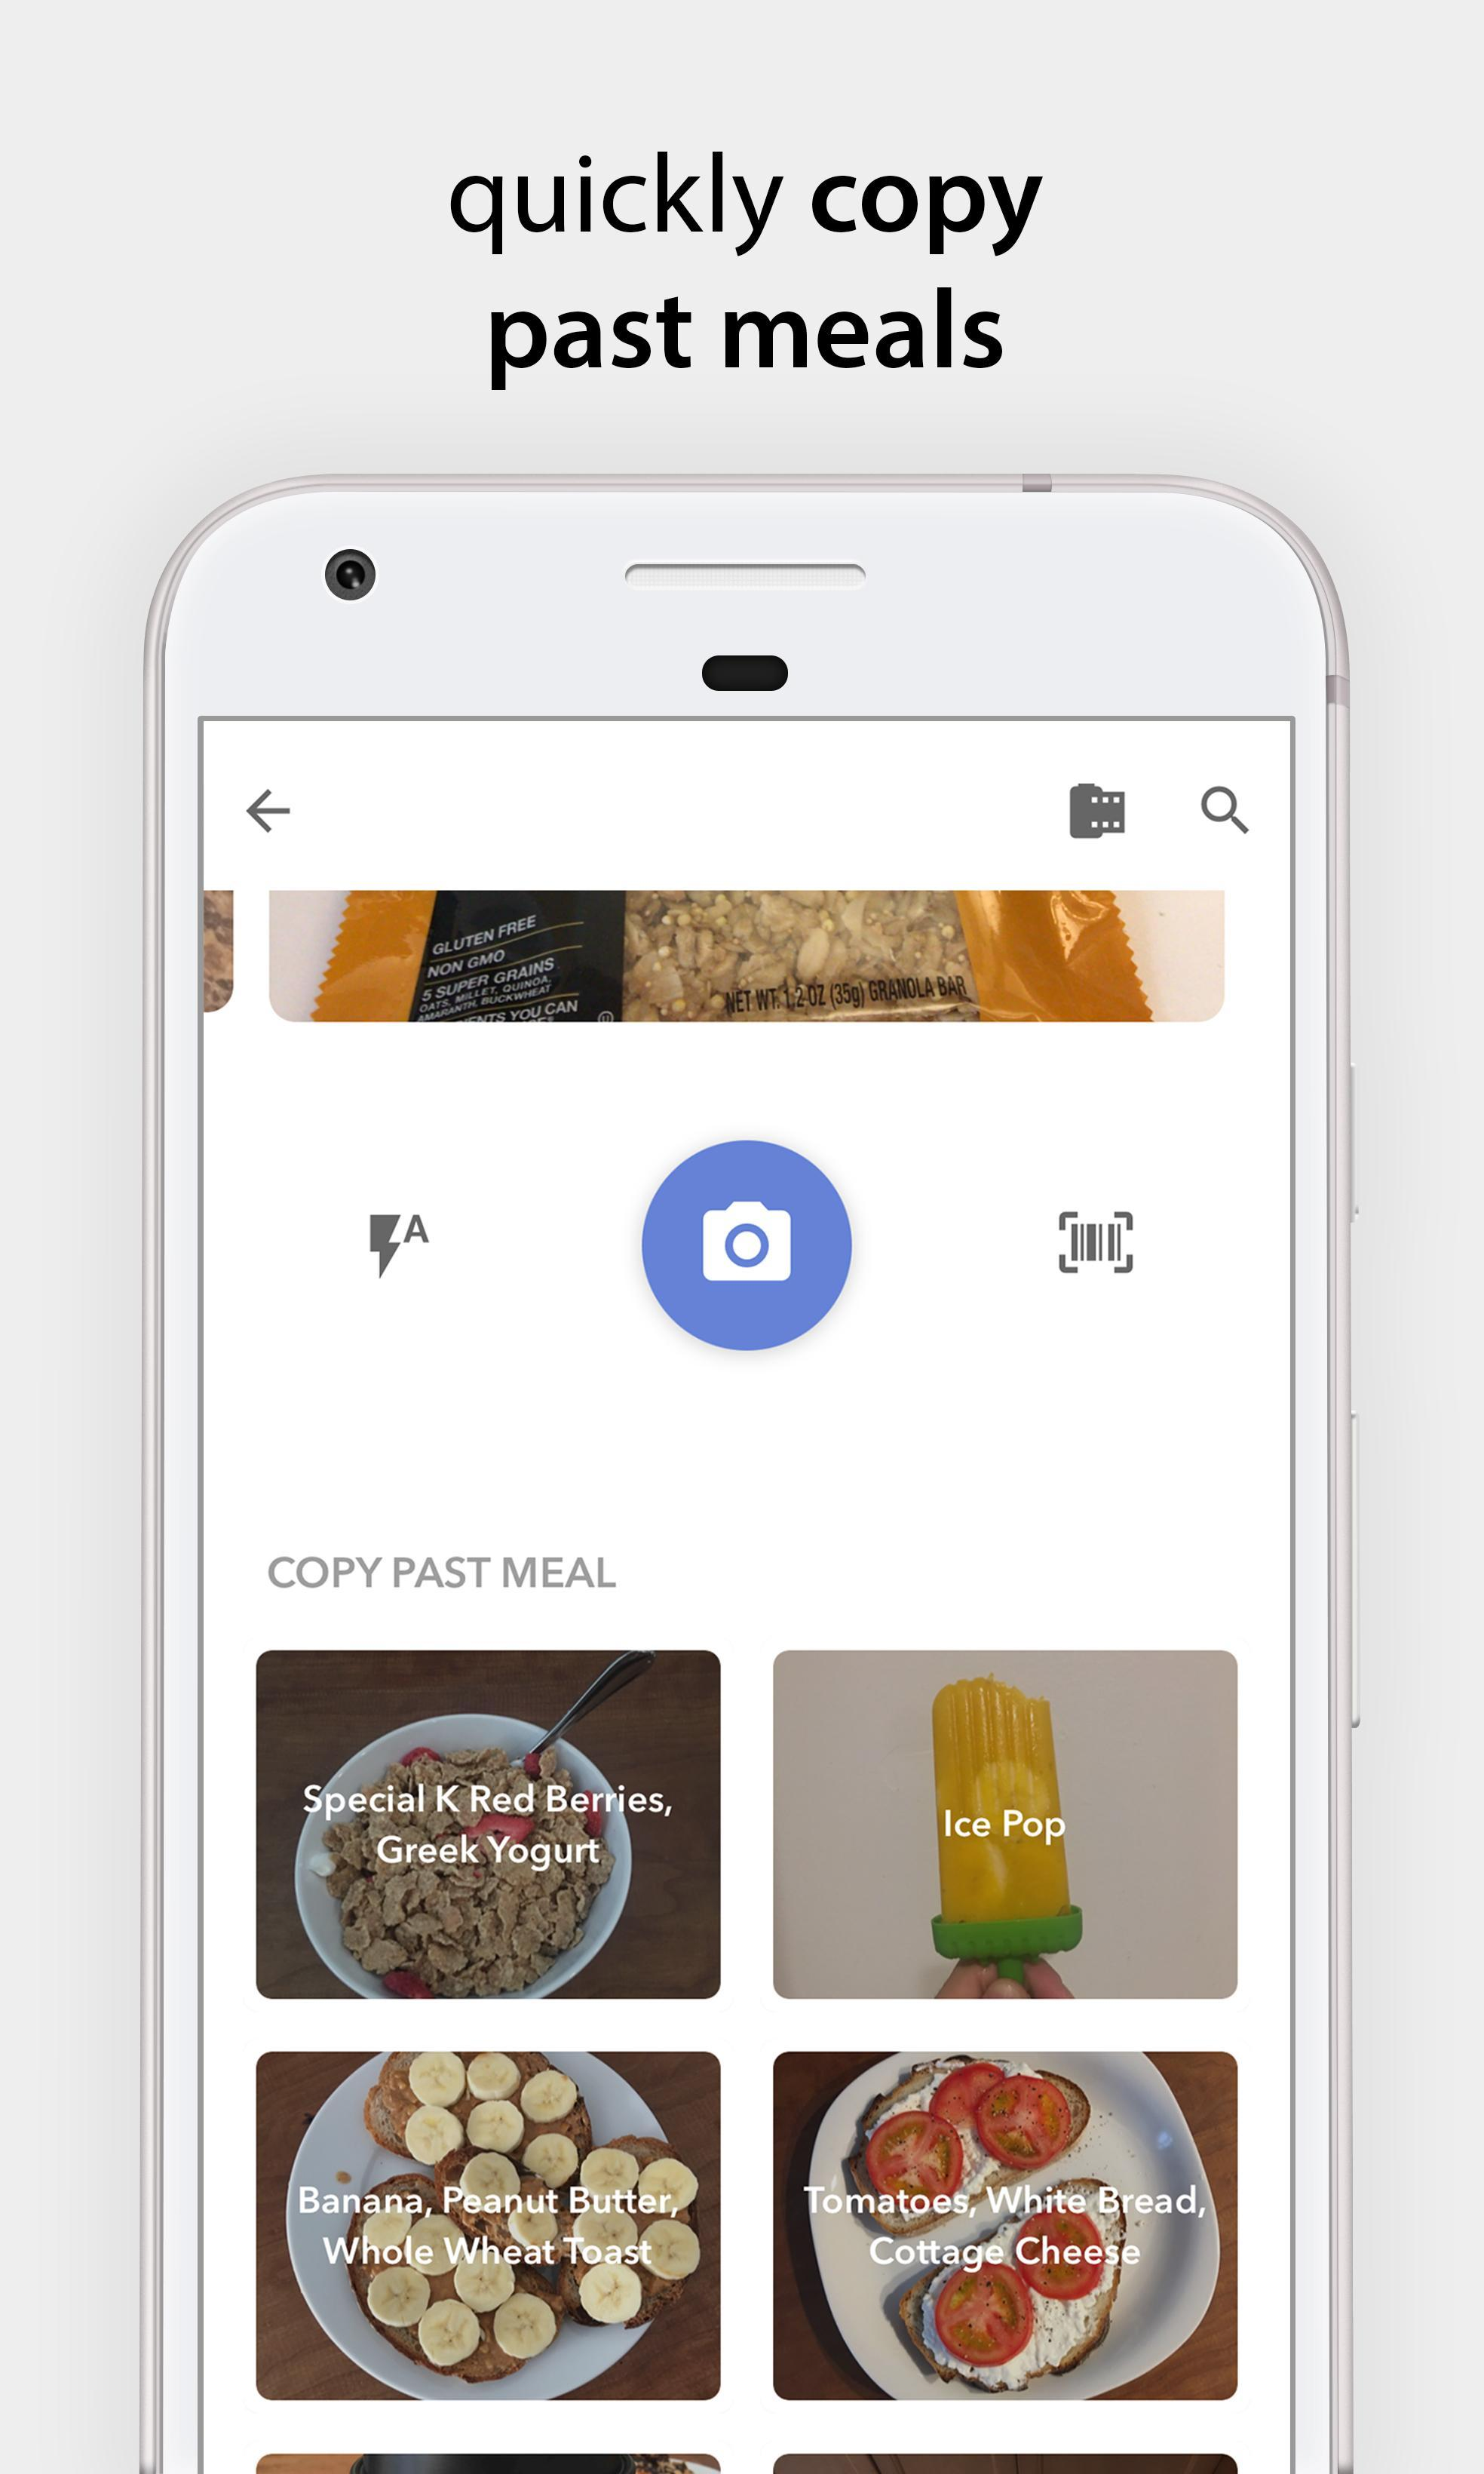 Bitesnap Photo Food Tracker and Calorie Counter 1.6.3 Screenshot 7